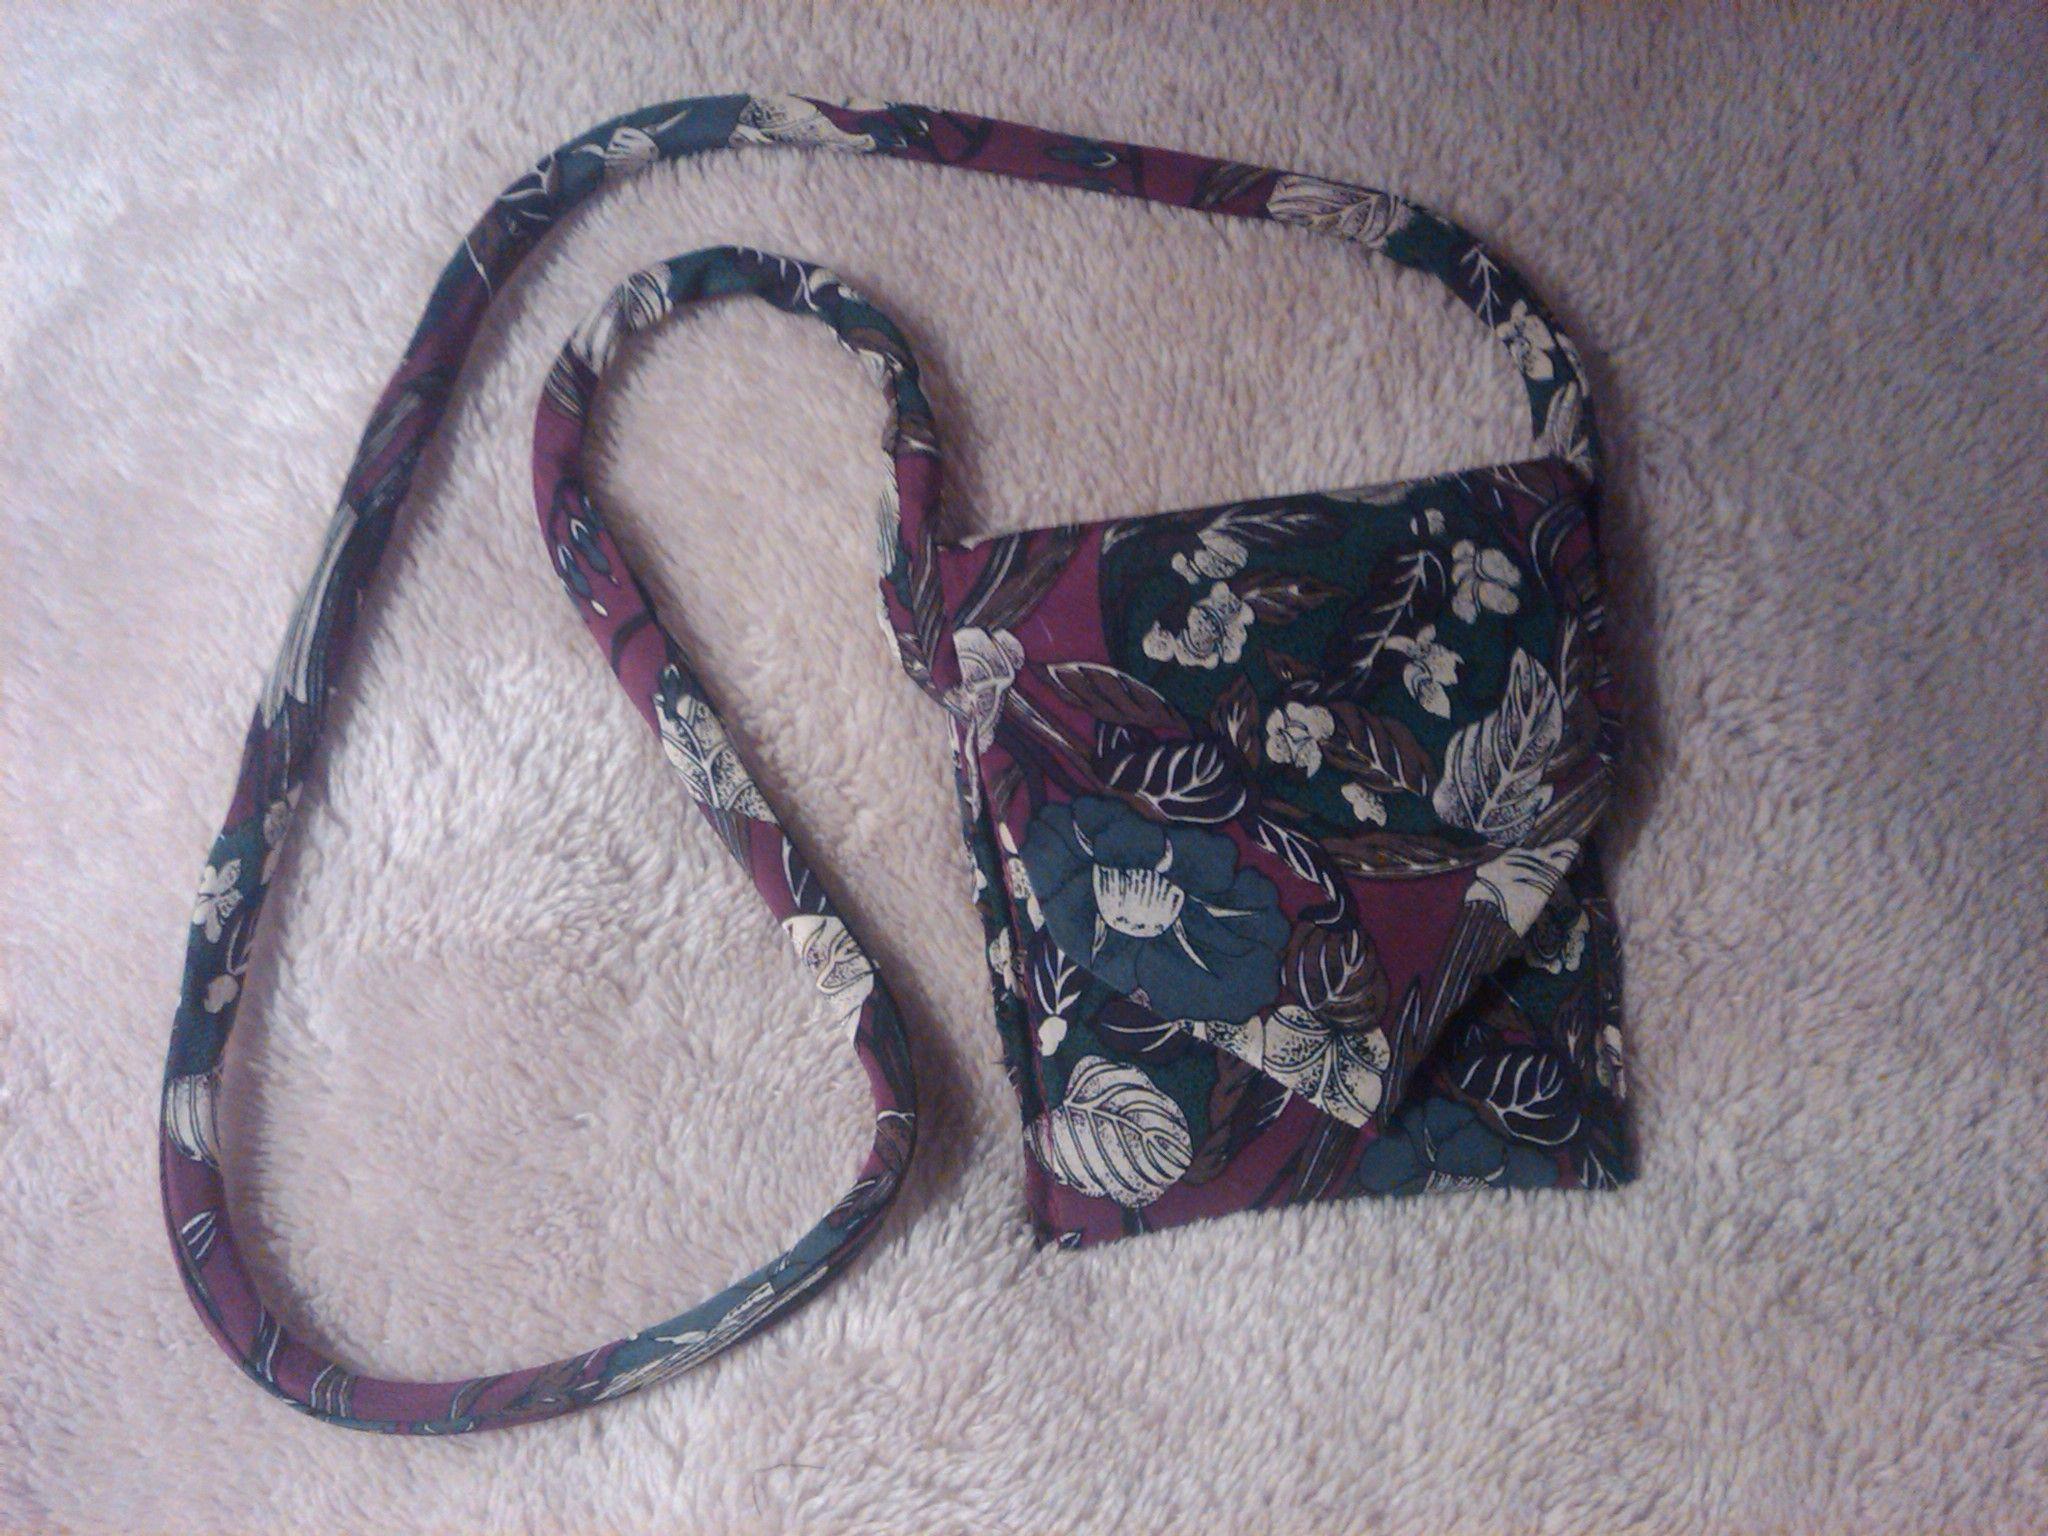 How To Make Homemade Handbags